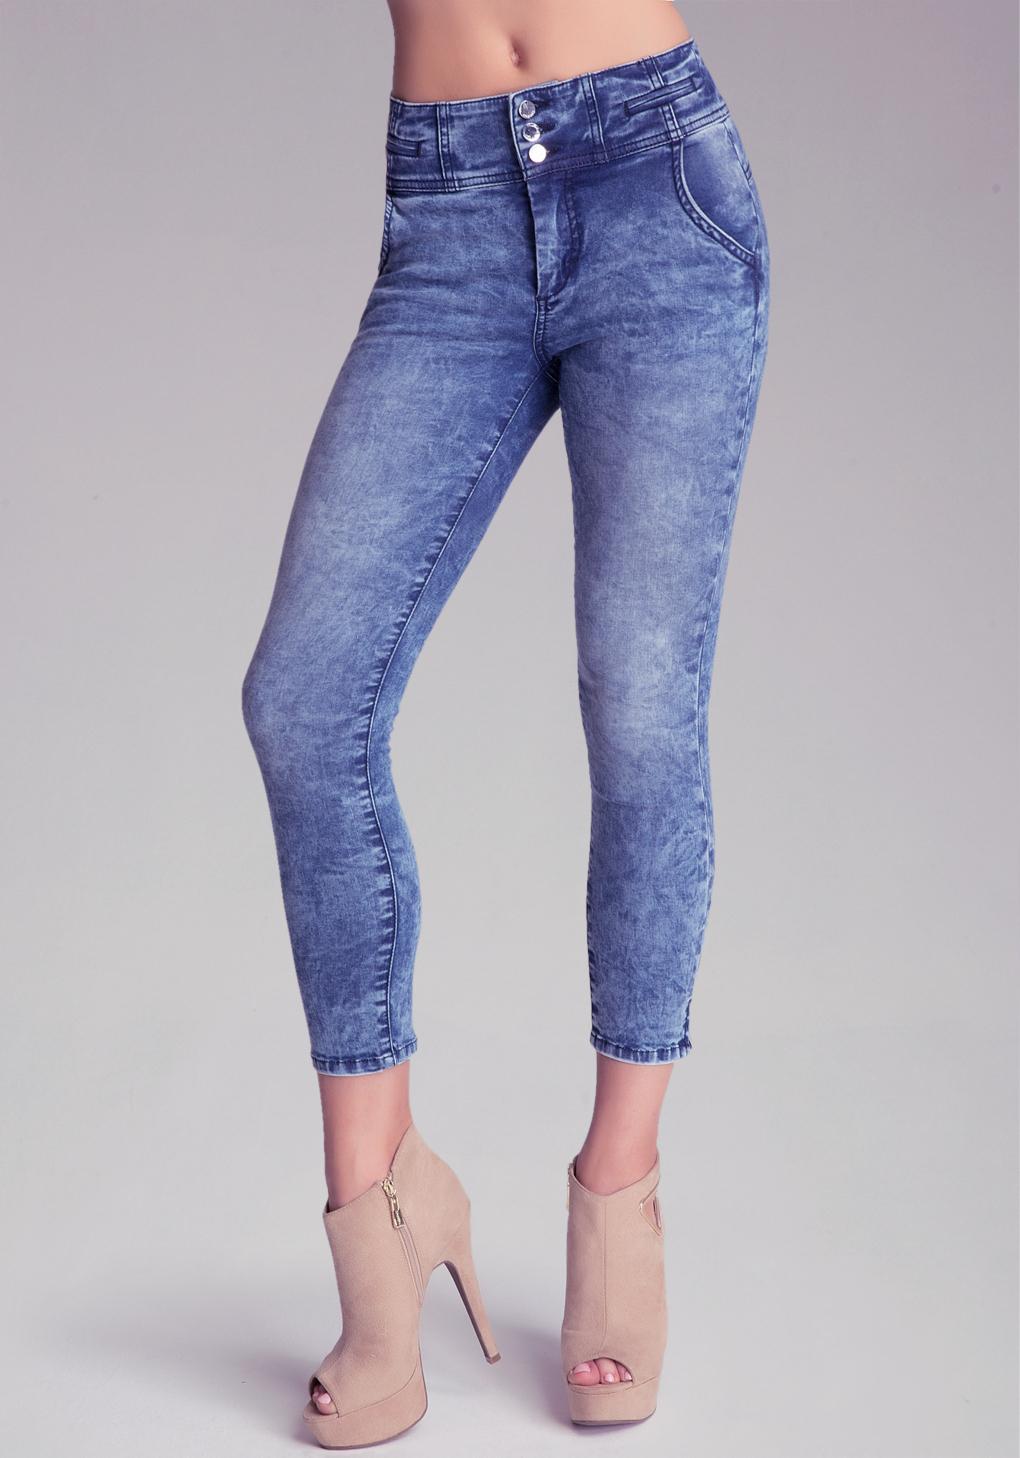 Bebe High-Waist Tux Capri Jeans in Blue | Lyst